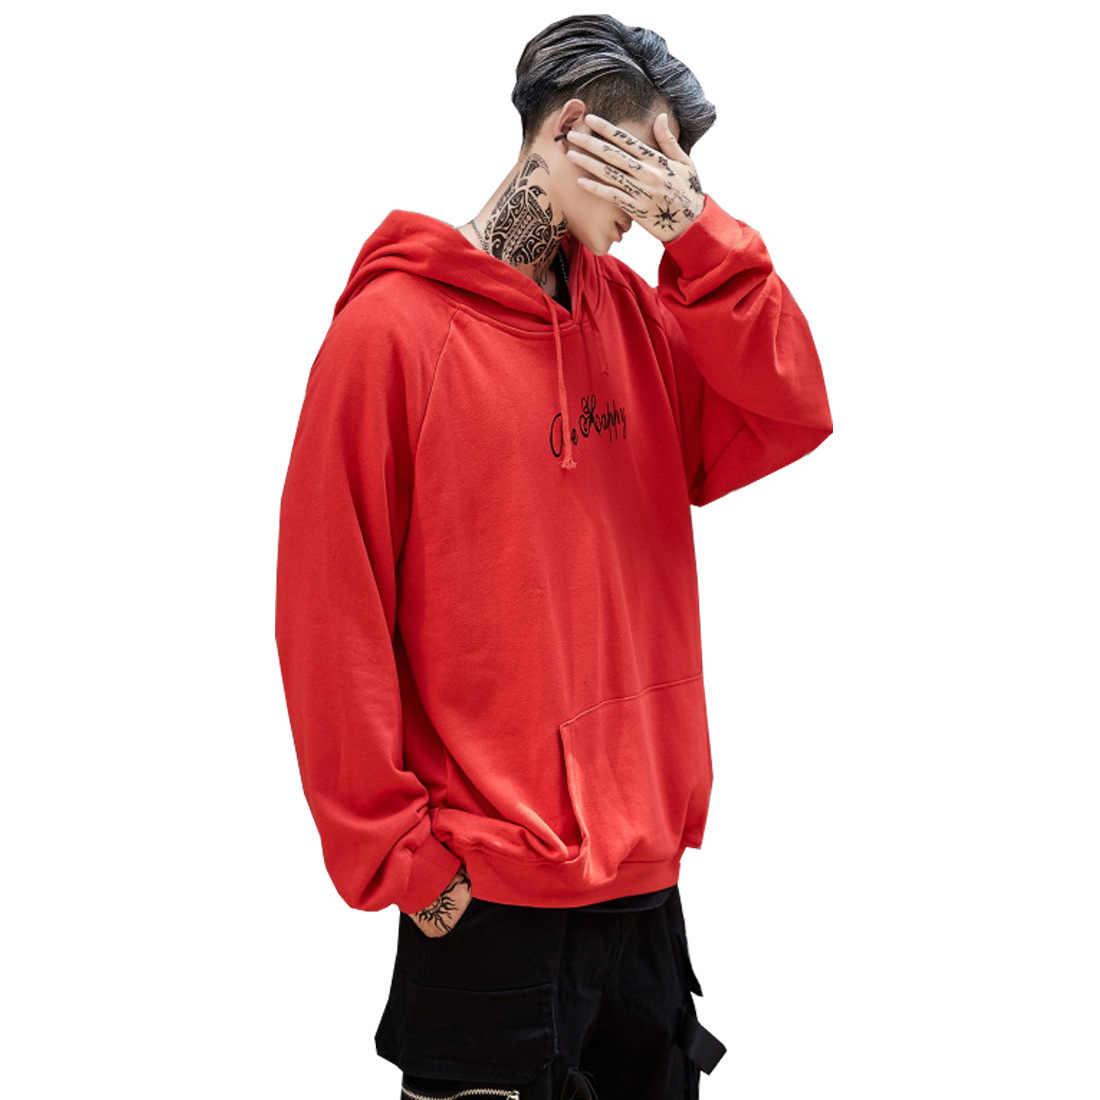 Meihuida 남성 캐주얼 오버 사이즈 루즈 후드 티 스웨터 스마일 프린트 헤드웨어 까마귀 힙합 streetwear 의류